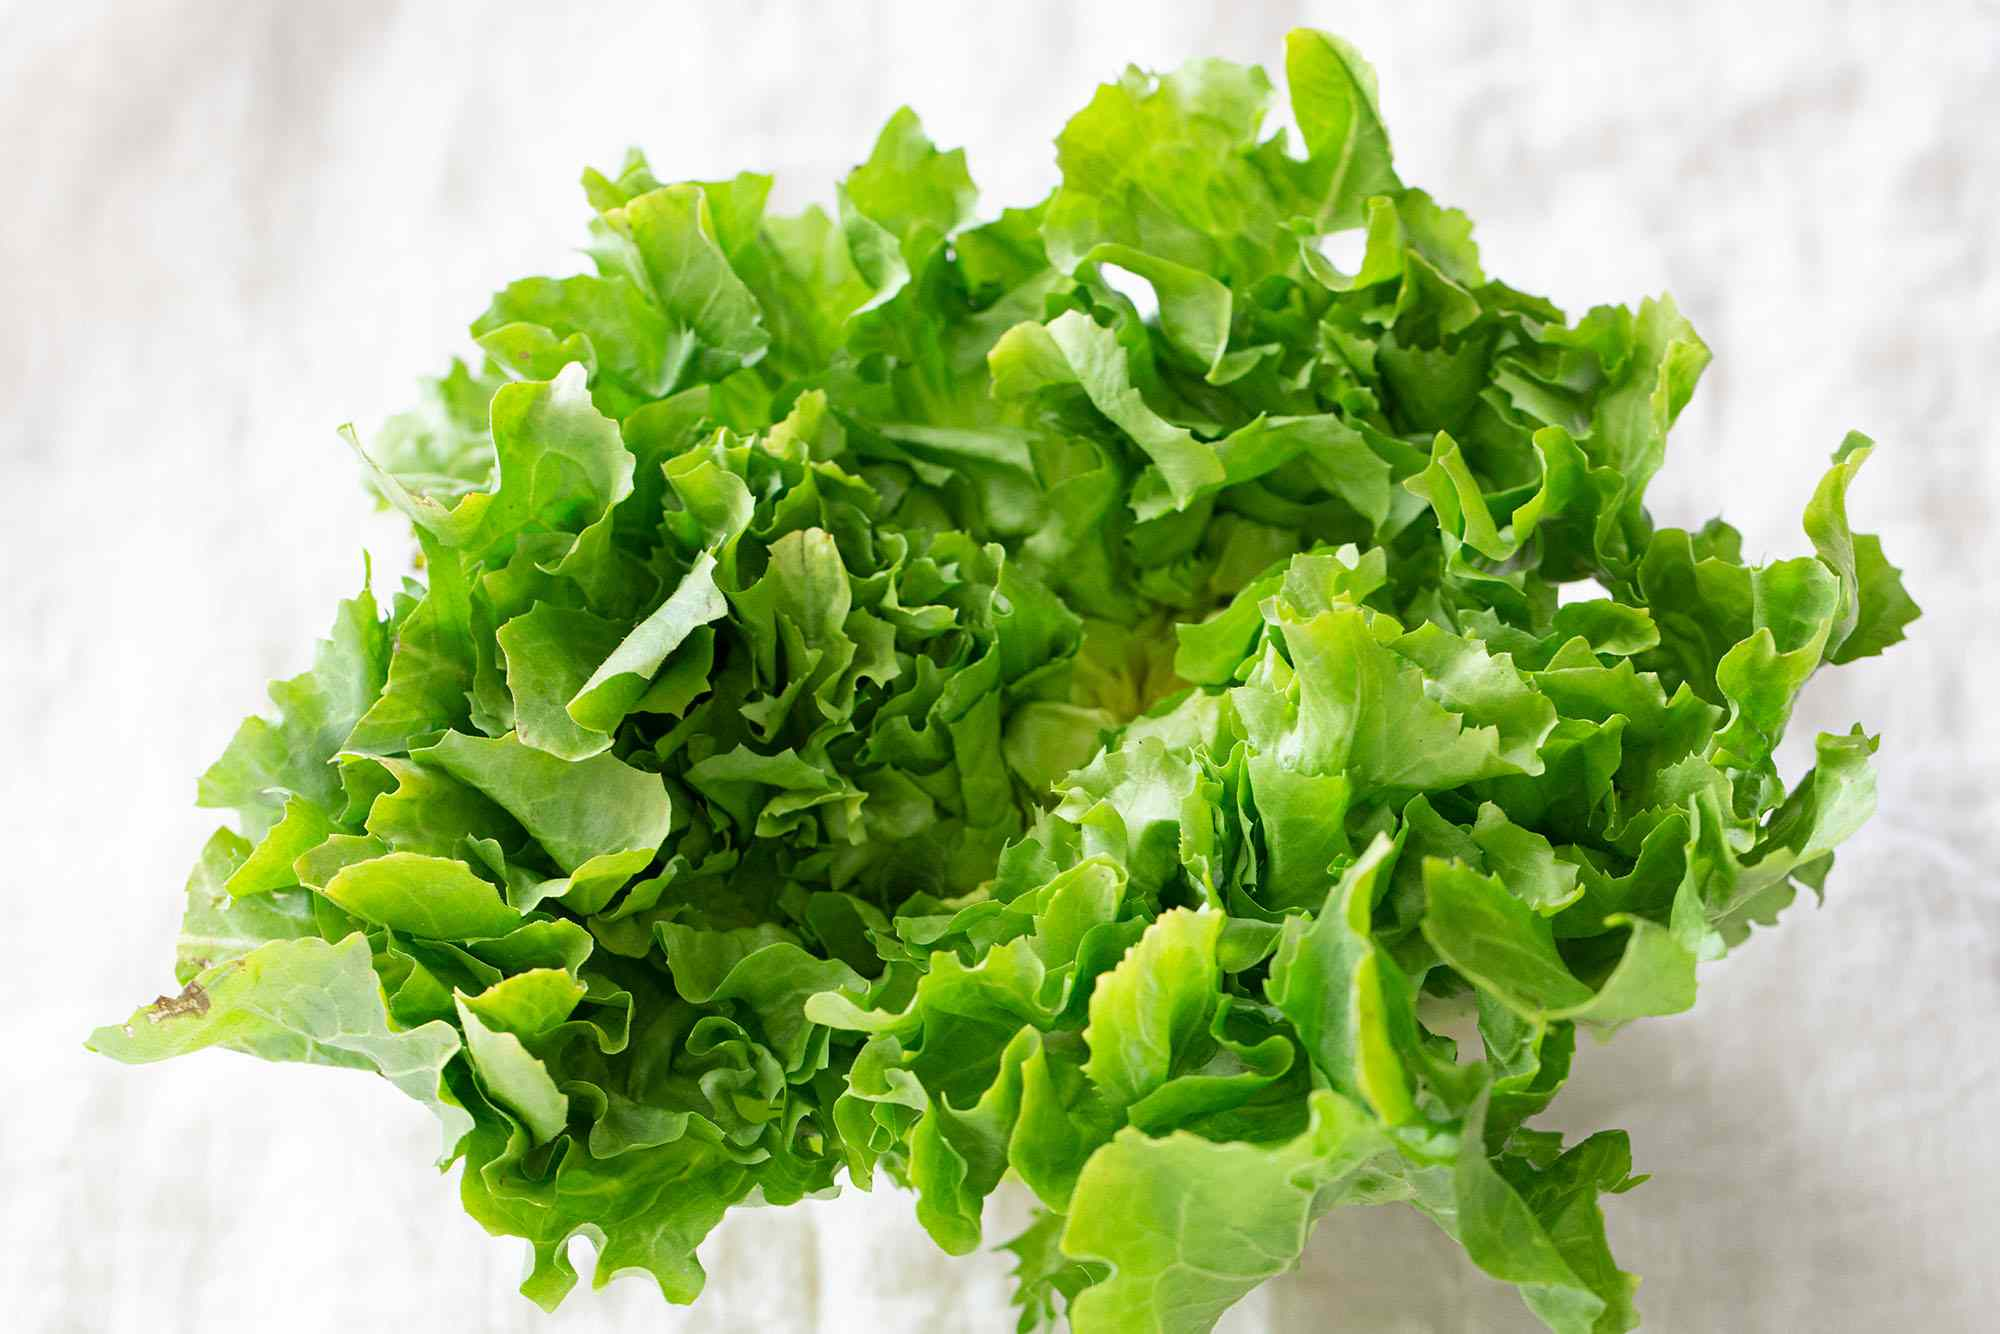 Fresh escarole lettuce on a white background.